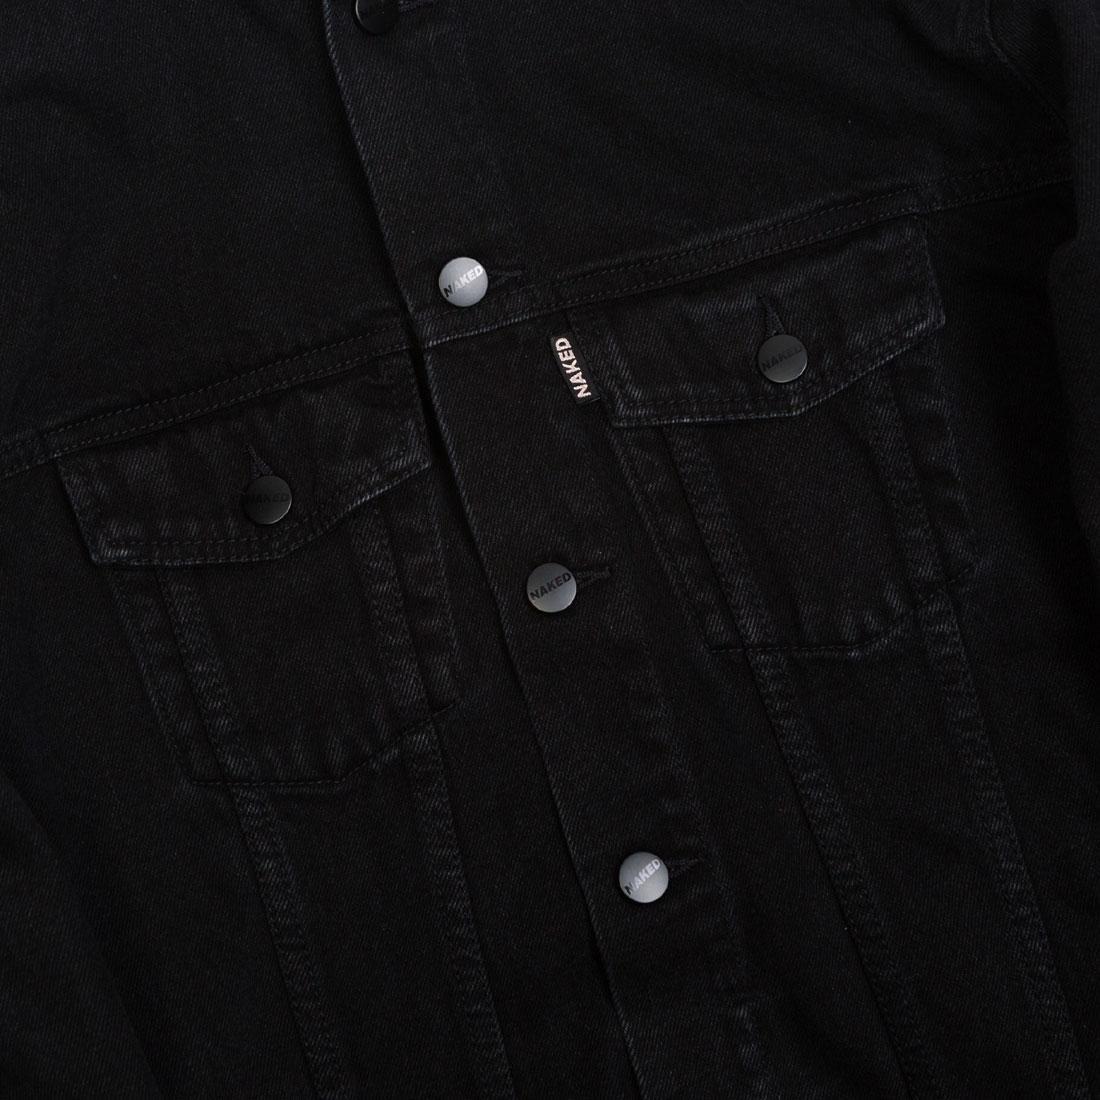 1df37847bc96 Adidas Consortium x Naked Women Denim Jacket (black)